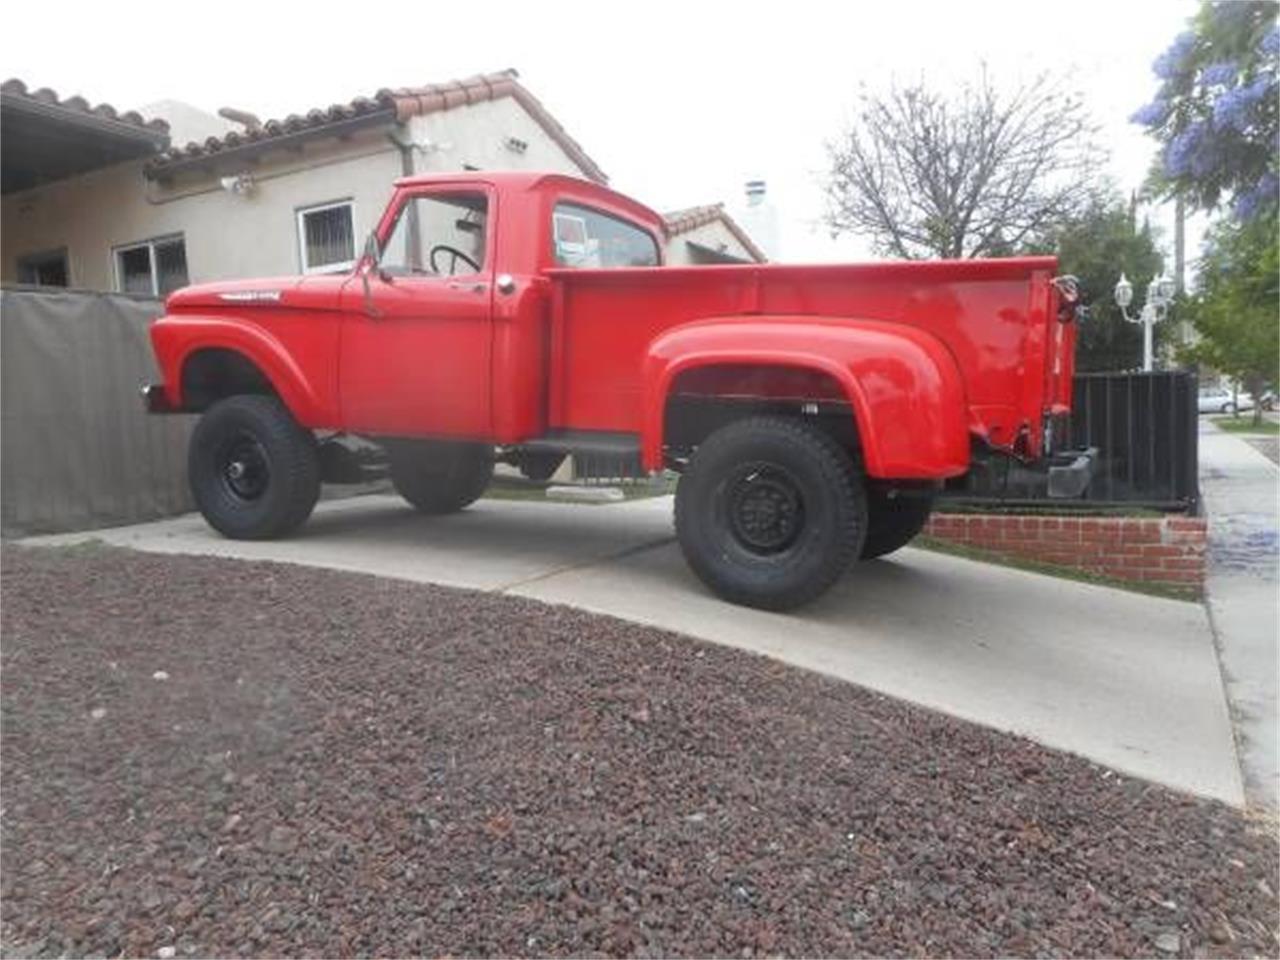 for sale 1961 ford f250 in cadillac, michigan cars - cadillac, mi at geebo